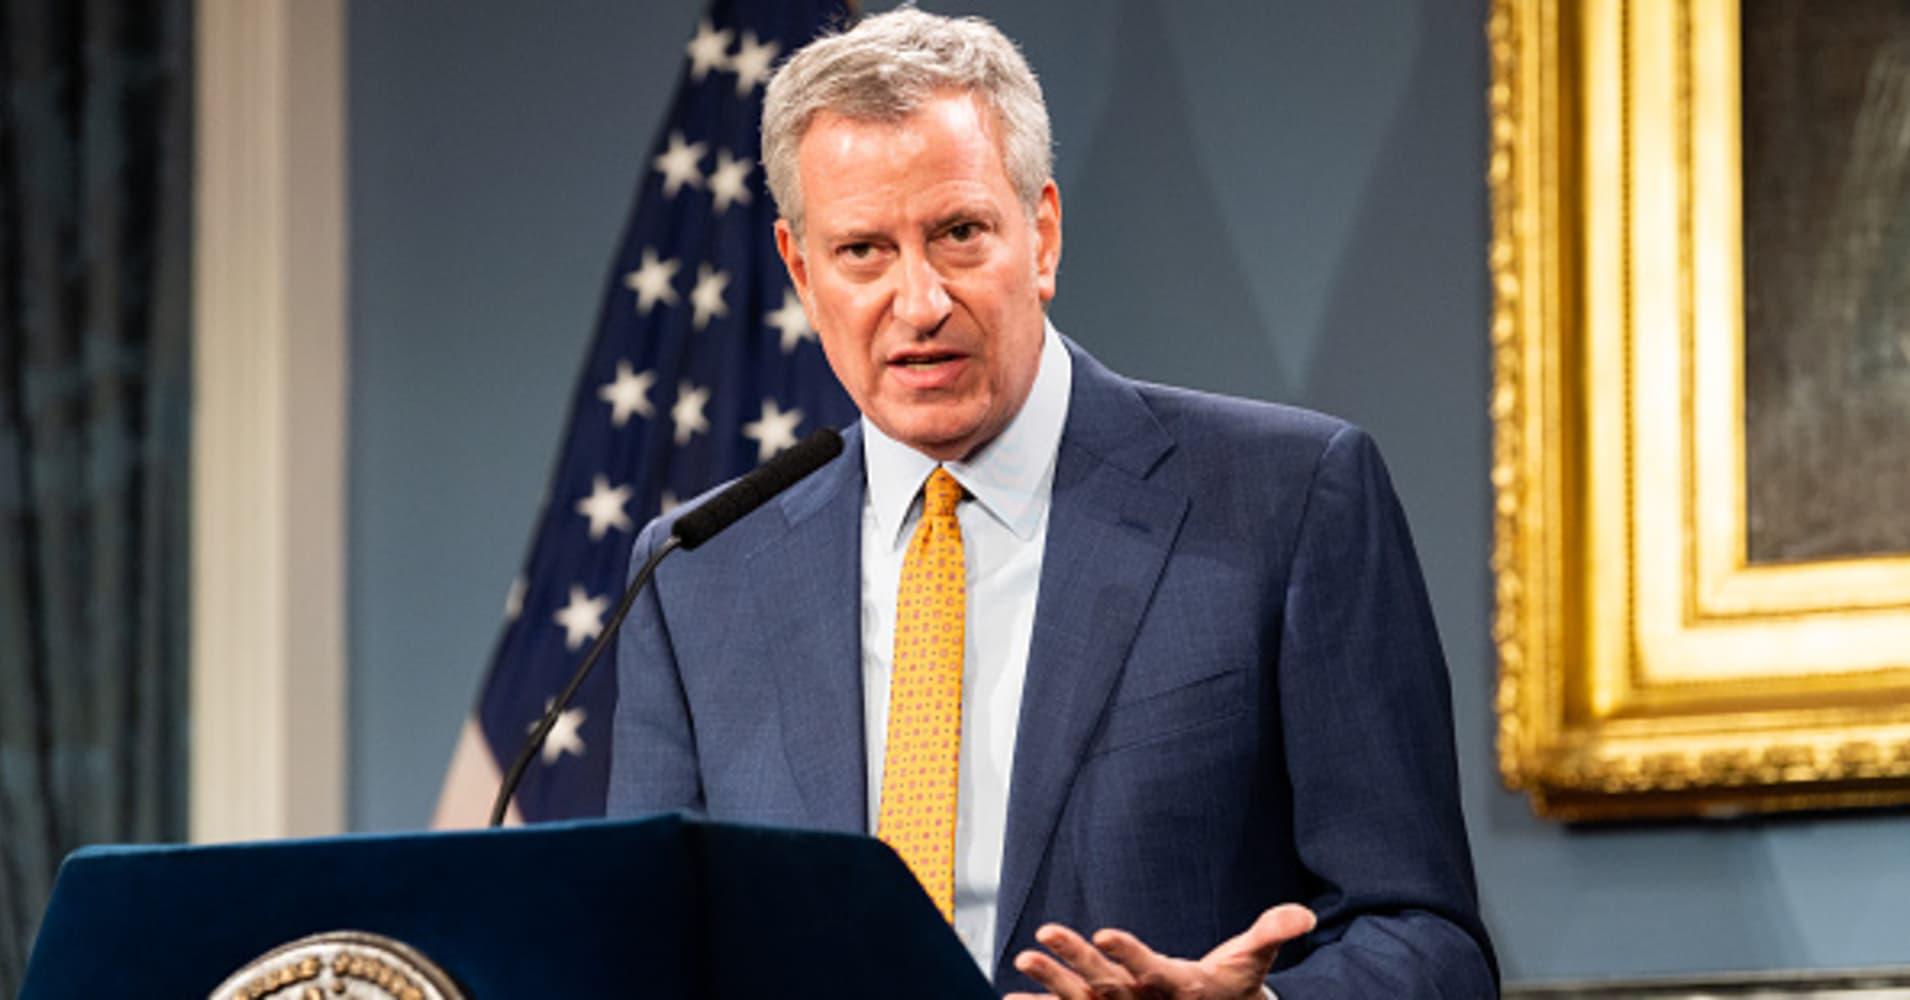 NYC Mayor de Blasio holds a press briefing on the coronavirus